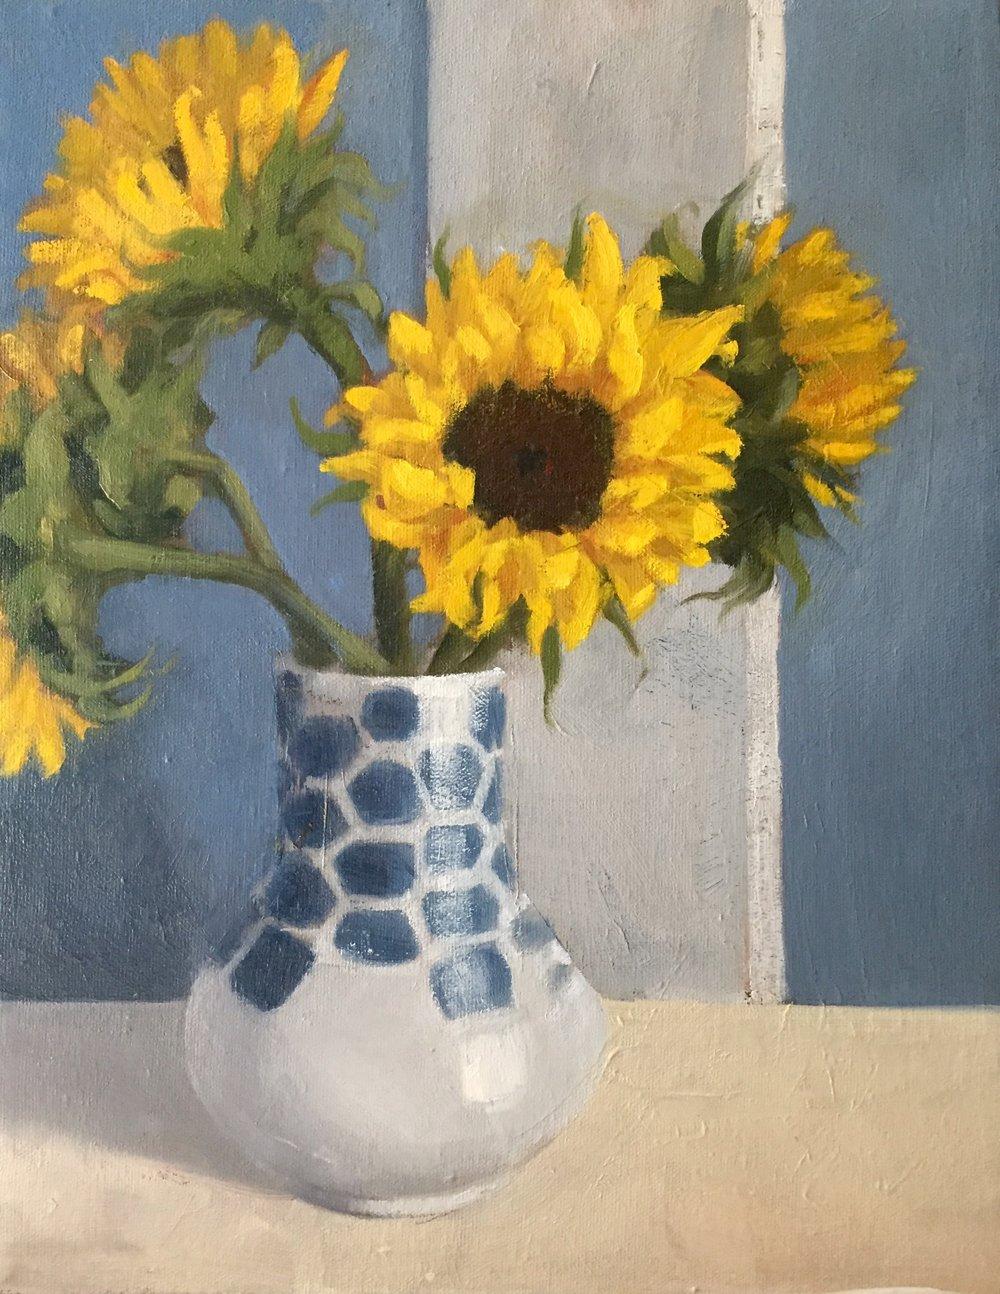 Sunflower Study  11x14 oil on canvas 2018